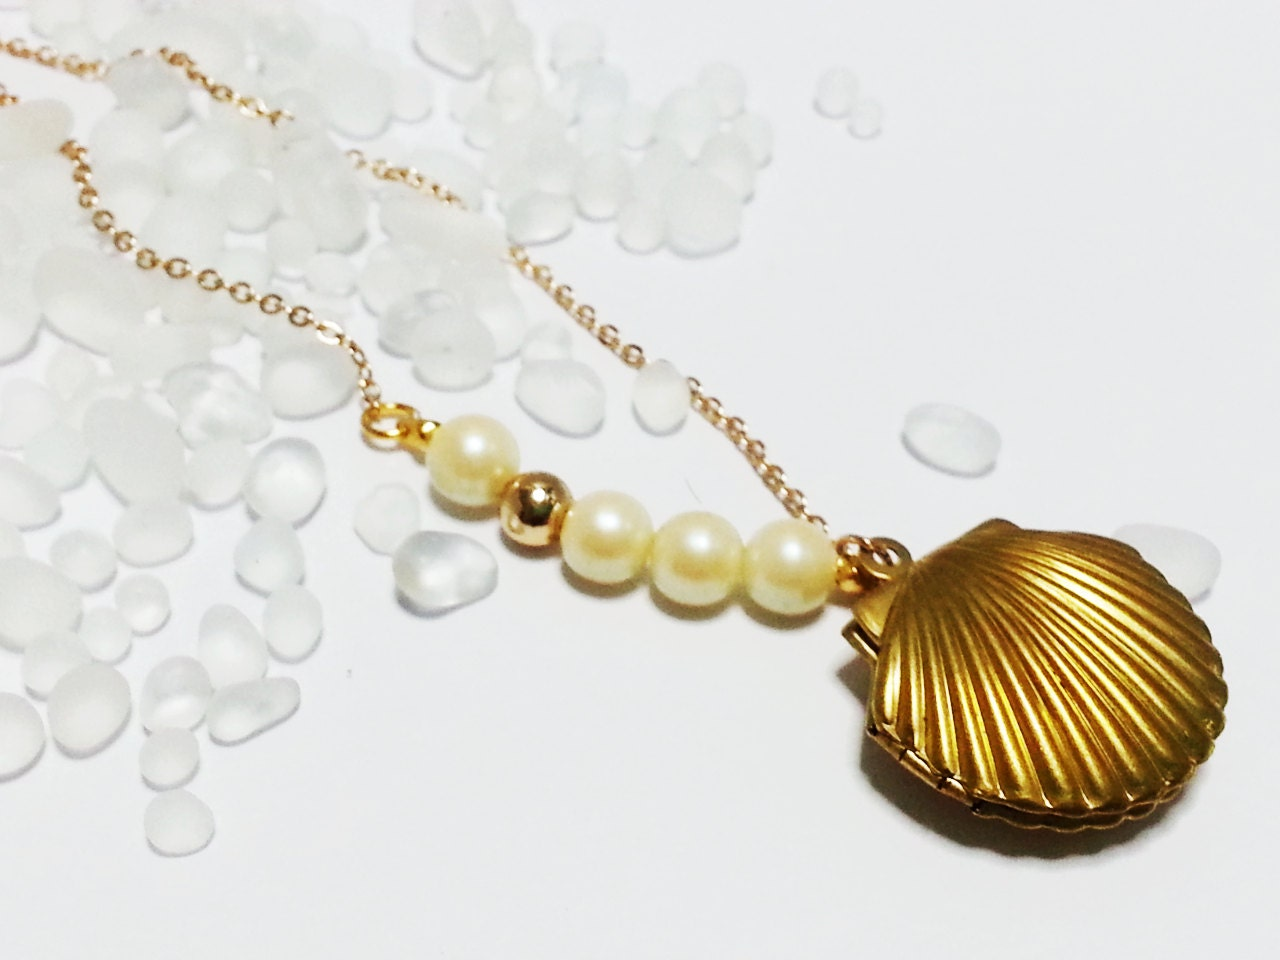 mermaid sea shell locket necklace by thewabbithole